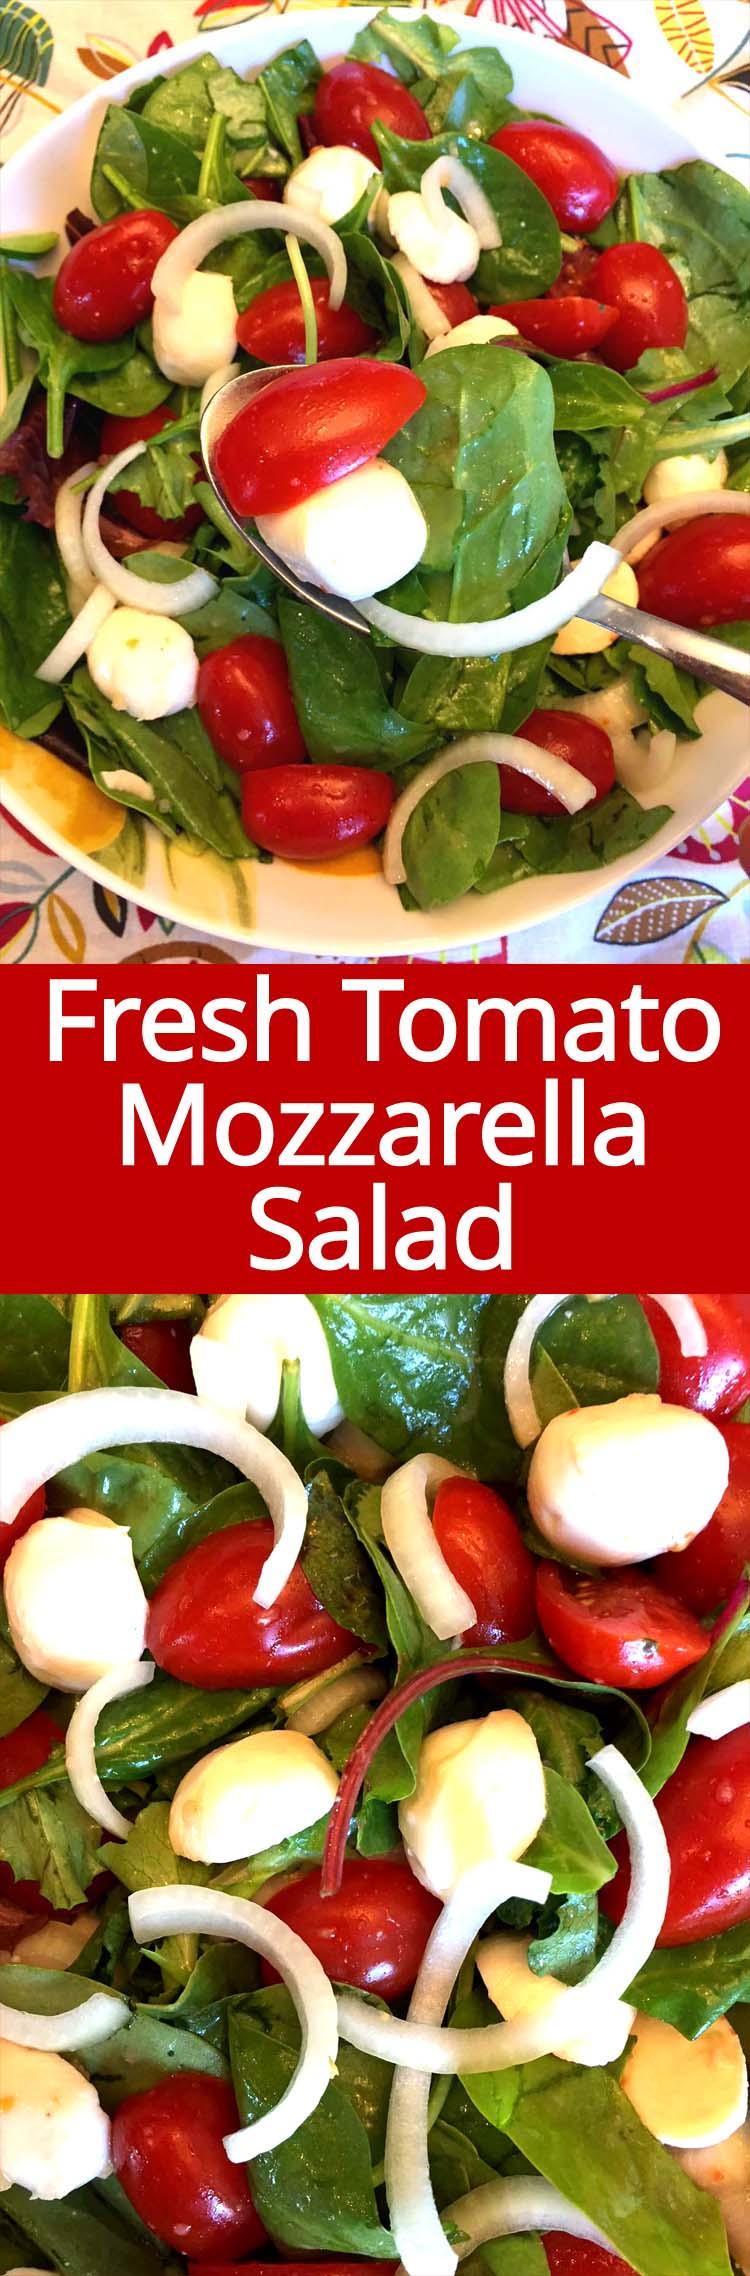 This fresh tomato mozzarella salad is amazing! I love fresh mozzarella!